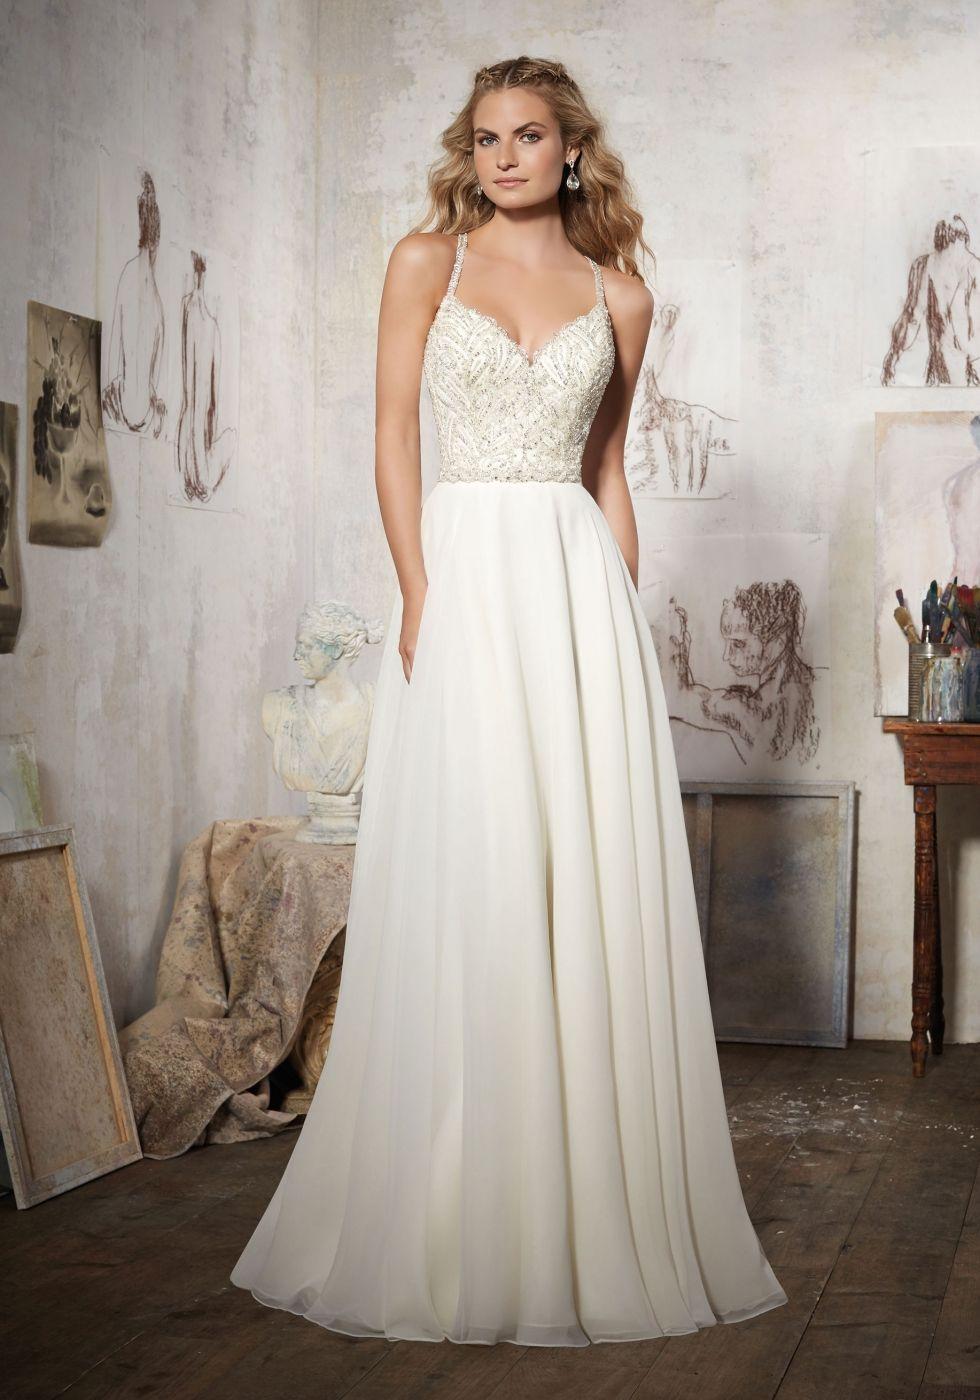 beaded chiffon wedding dress. morilee wedding dress. Aline wedding ...